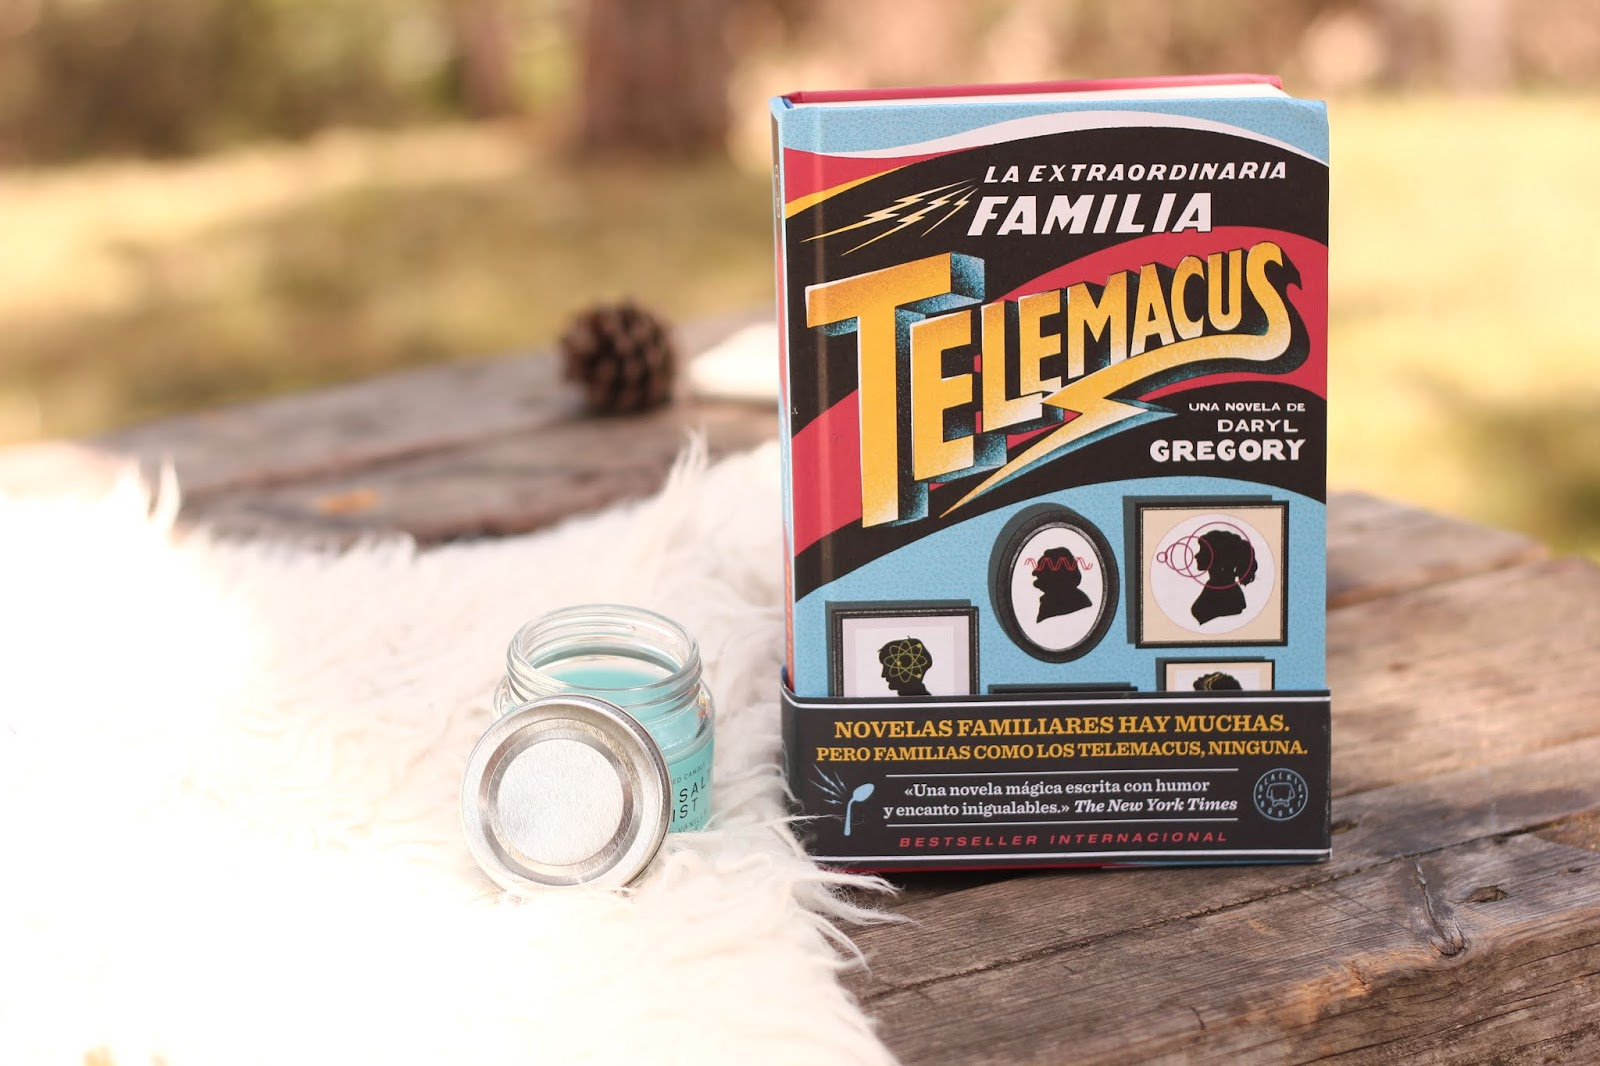 La Increíble familia Telemacus